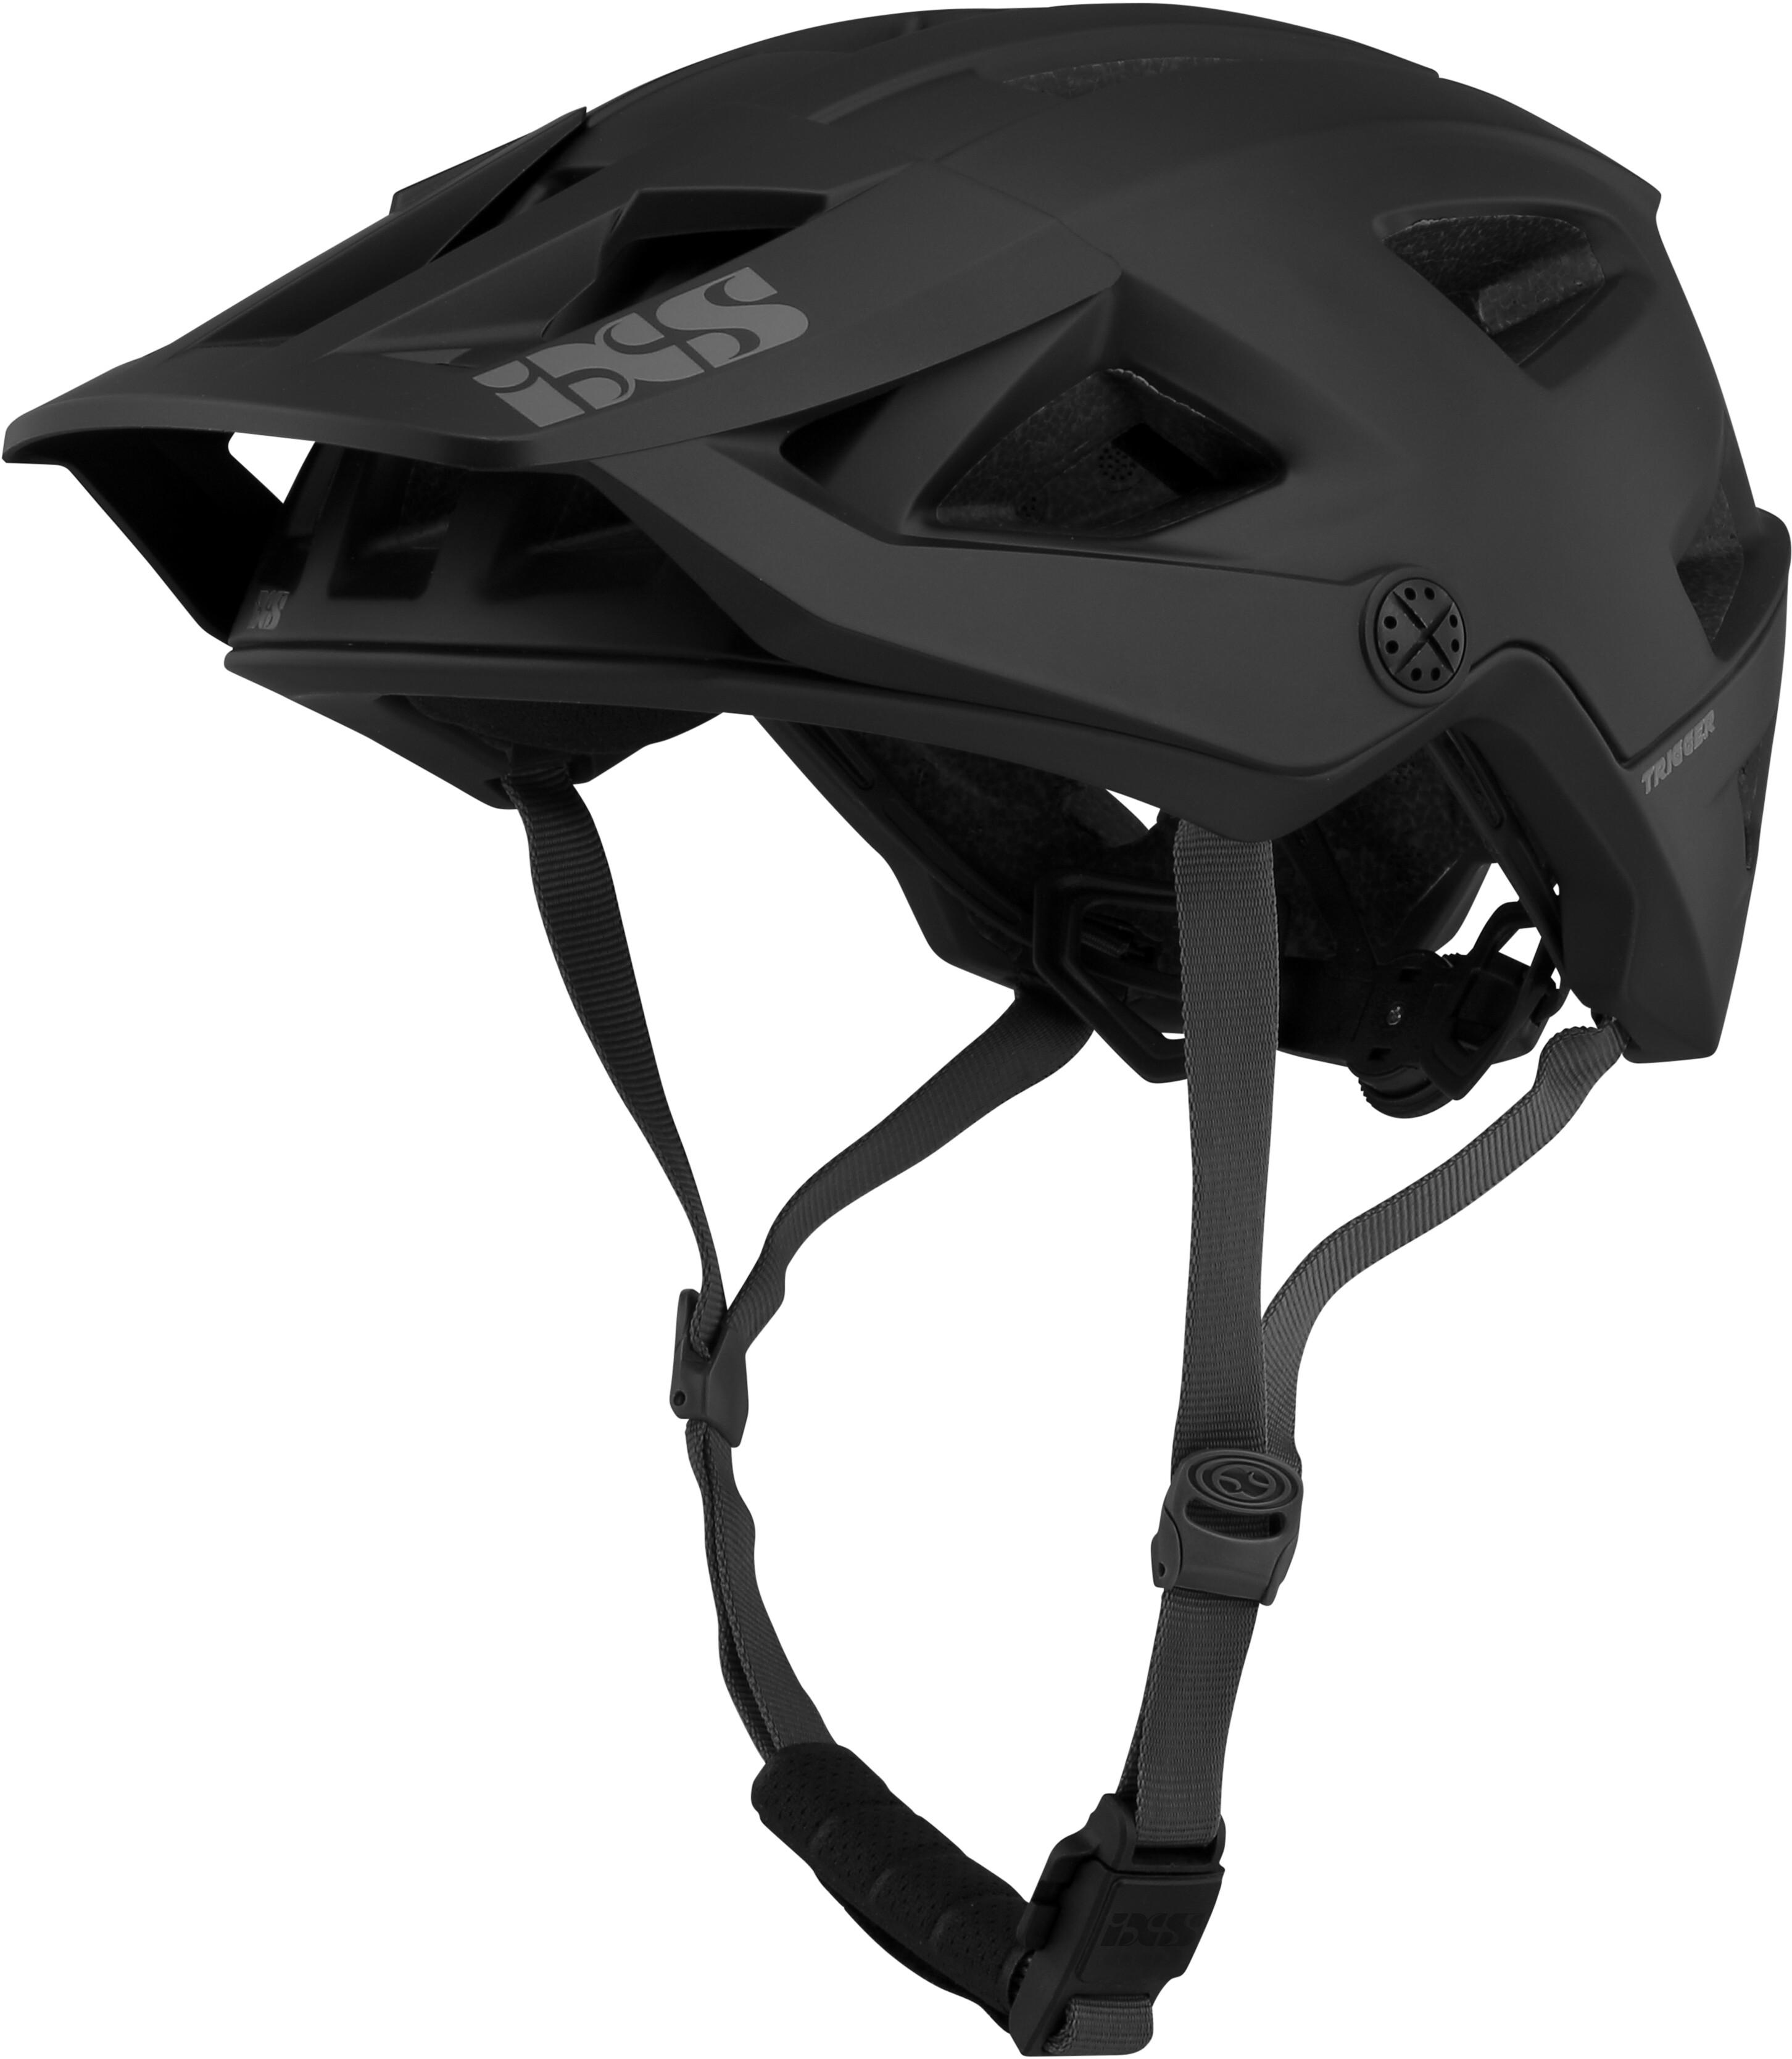 d315649a2c817 IXS Trigger AM casco per bici nero su Bikester